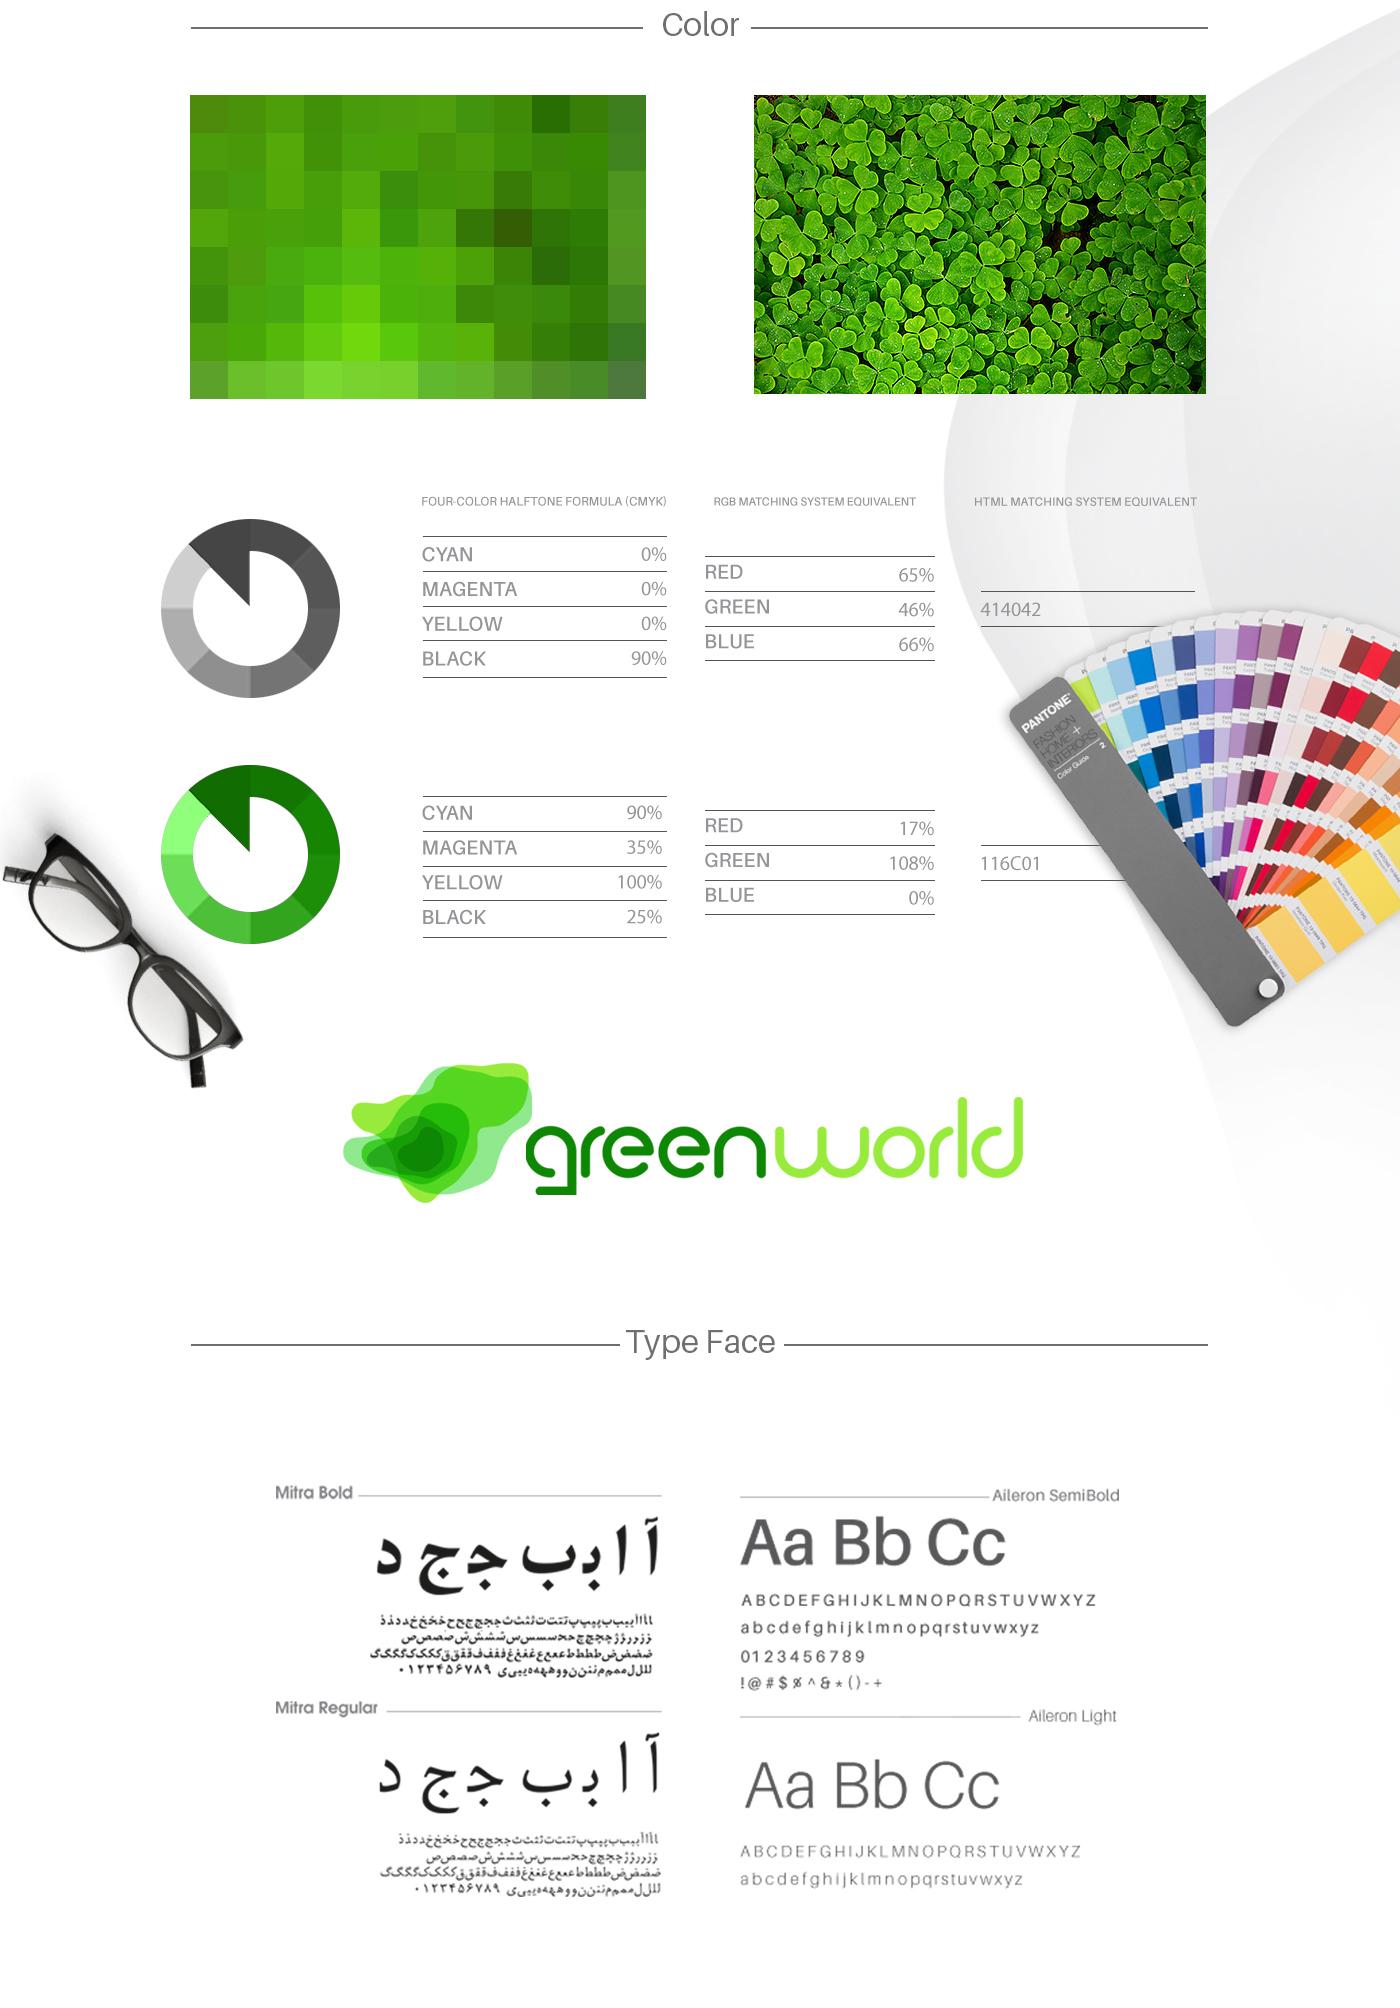 Greenworld (2)